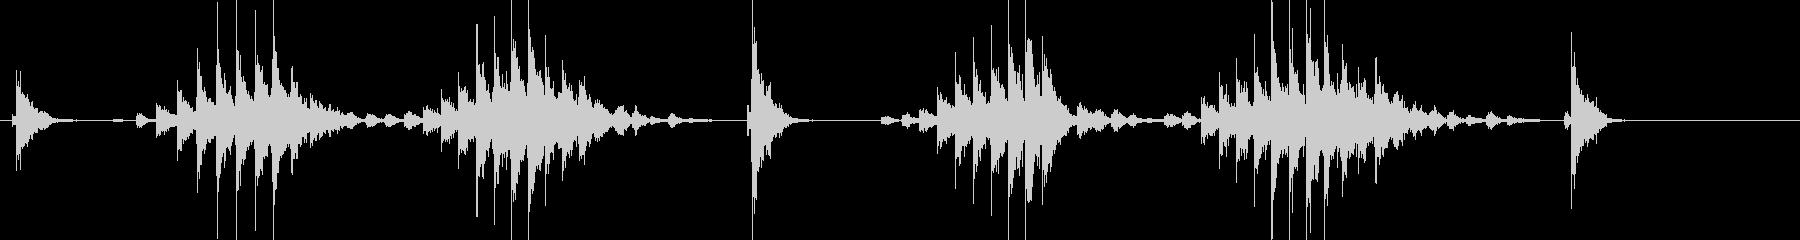 大太鼓14サザ浪歌舞伎情景描写和風和太鼓の未再生の波形